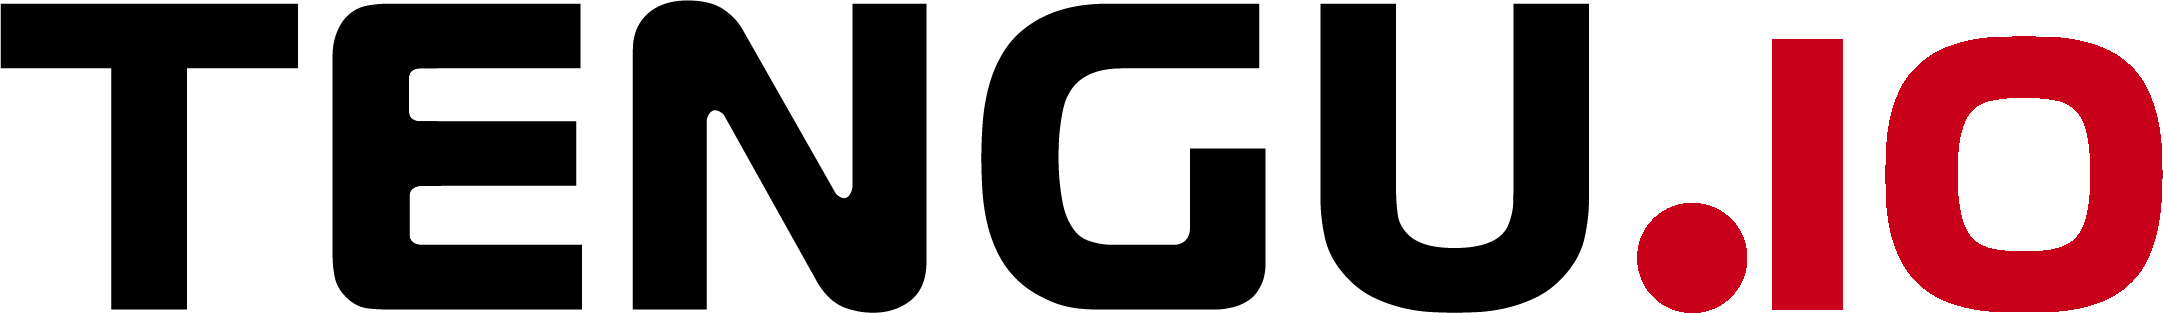 Black version Transparant background(IO) (1) (1)